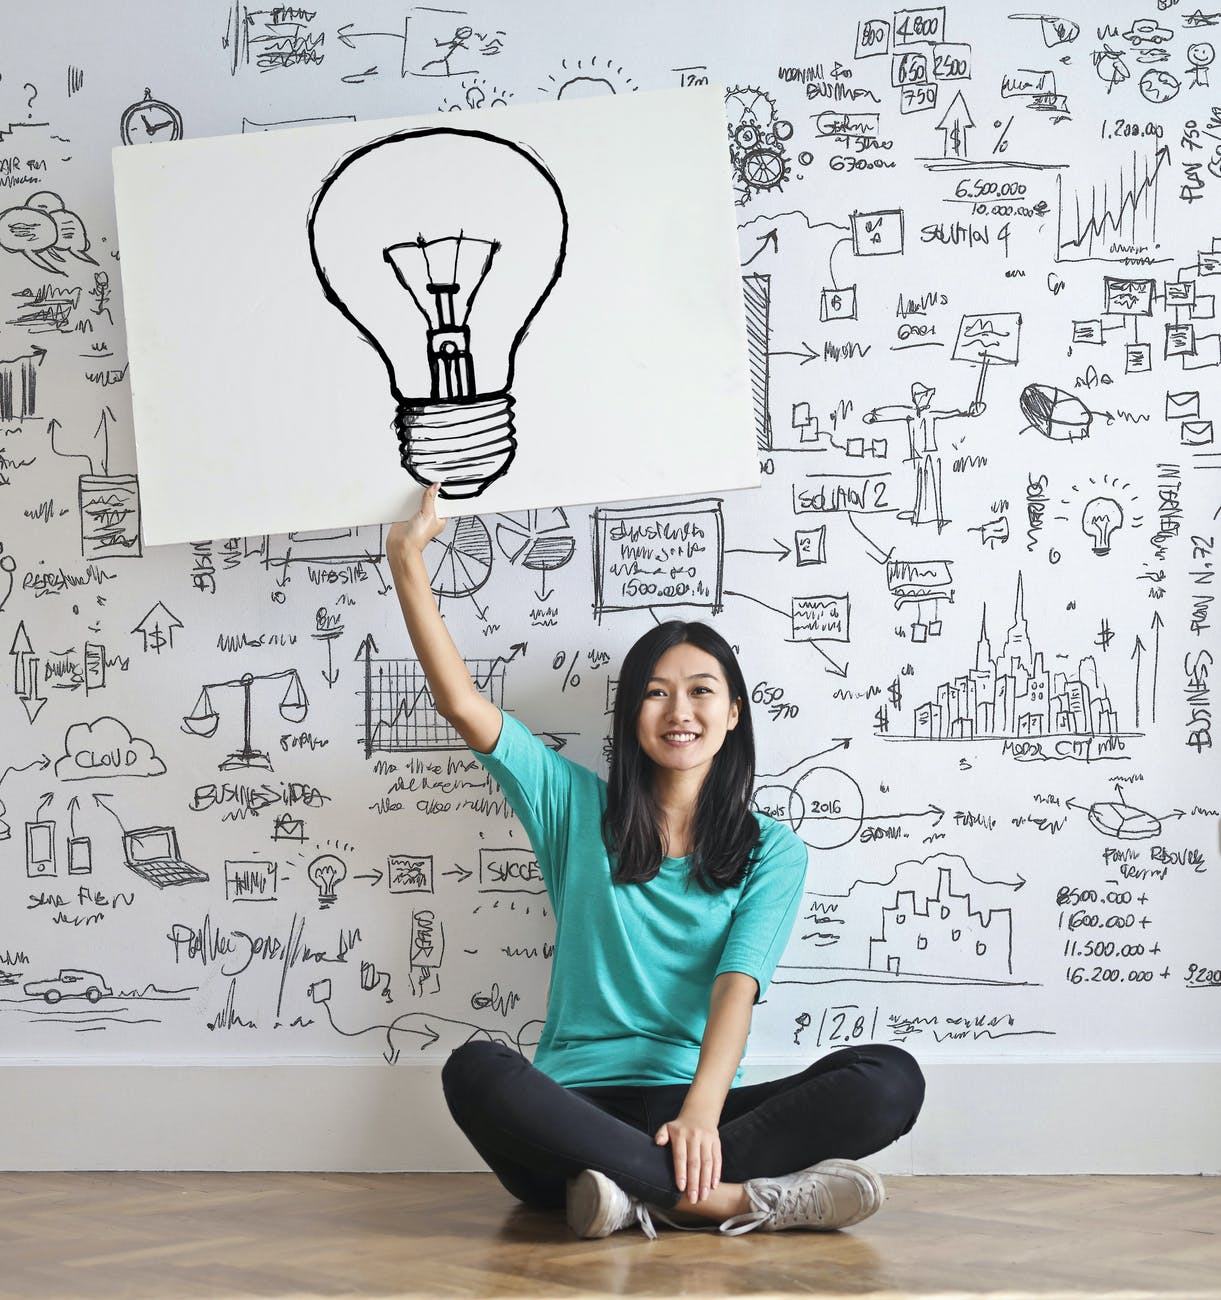 10 Ways to Inspire Your Creativity, blog post by Aspasia S. Bissas, aspasiasbissas.com. Creative, inspiration, art, writing, create.